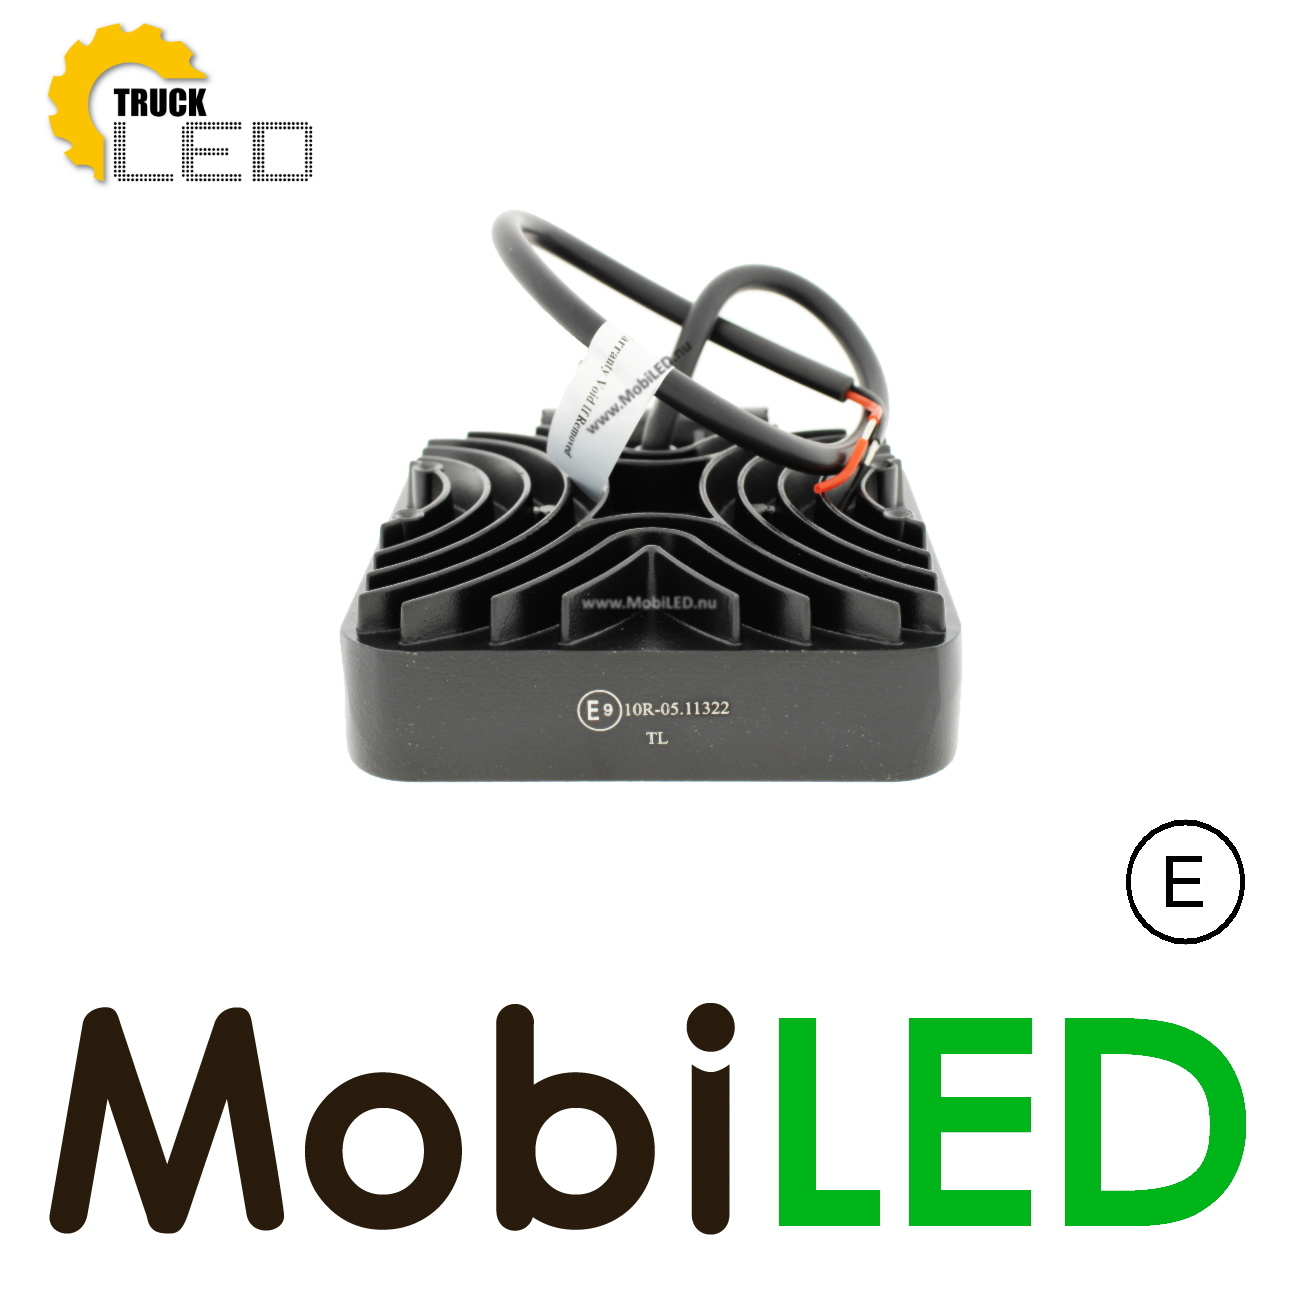 TruckLED Werklamp 15 watt vierkant extra dun met E-Keur